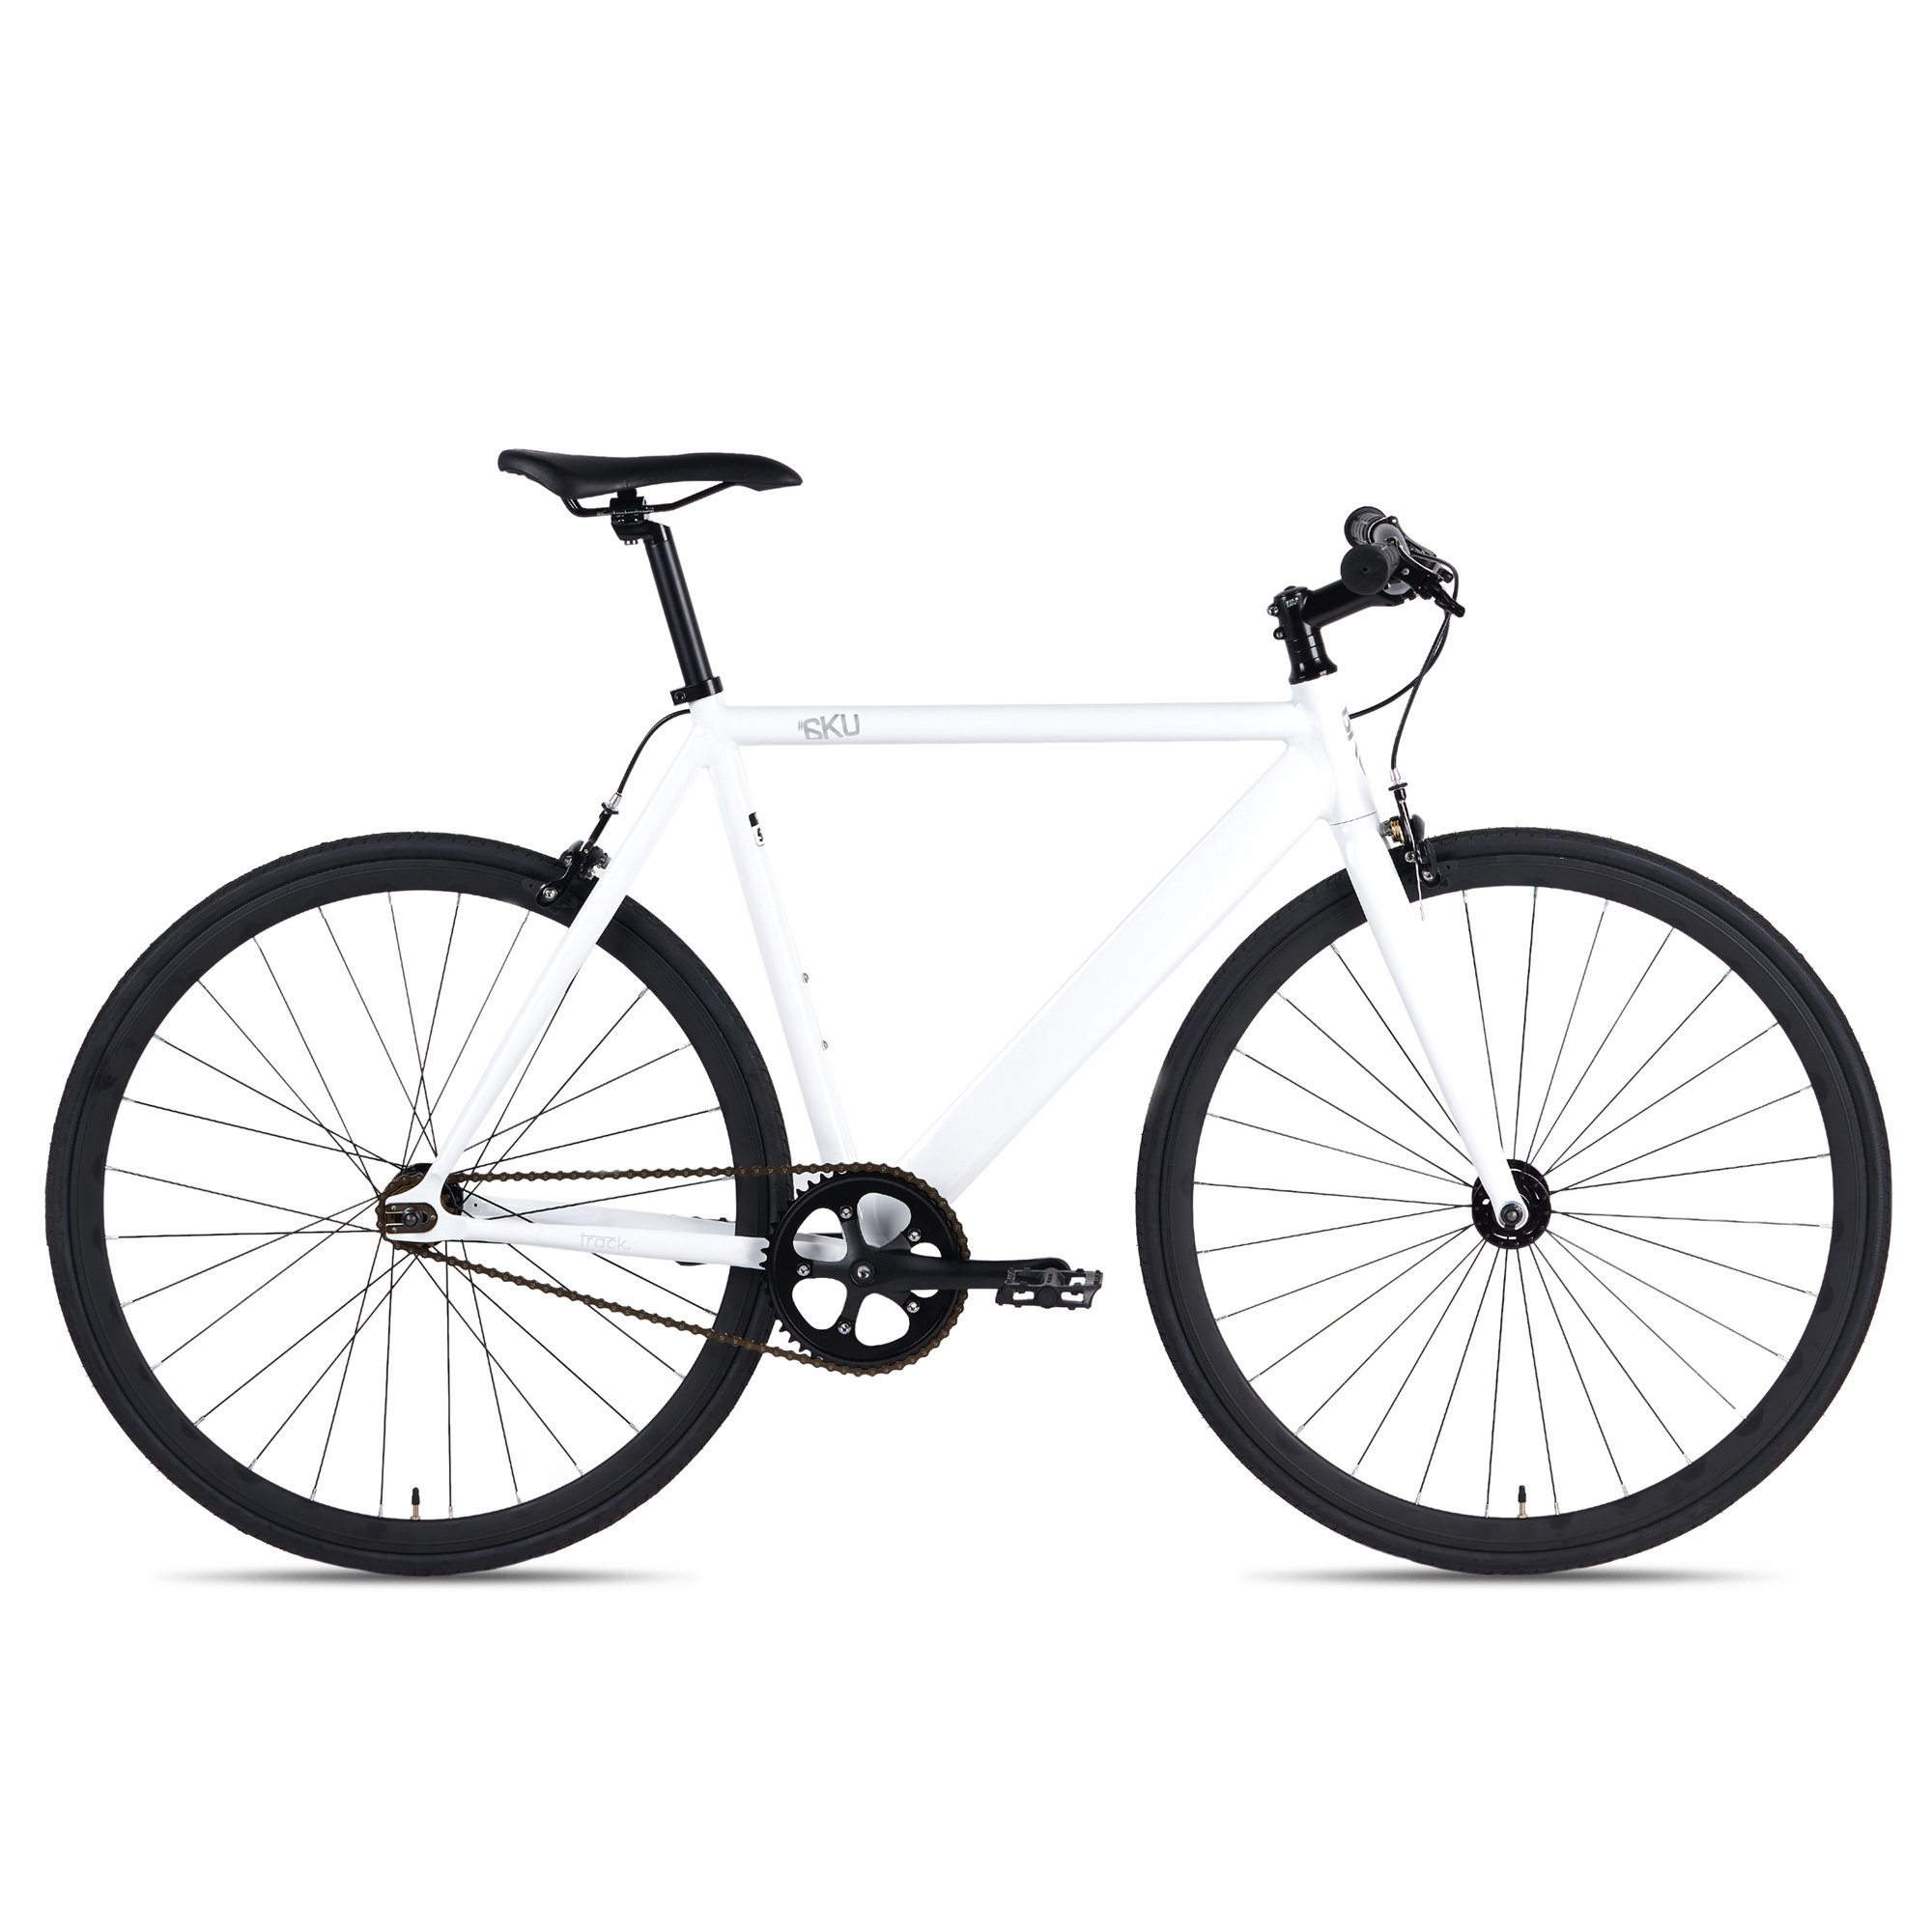 6ku Aluminum Fixed Gear Single Speed Fixie Urban Track Bike 2019